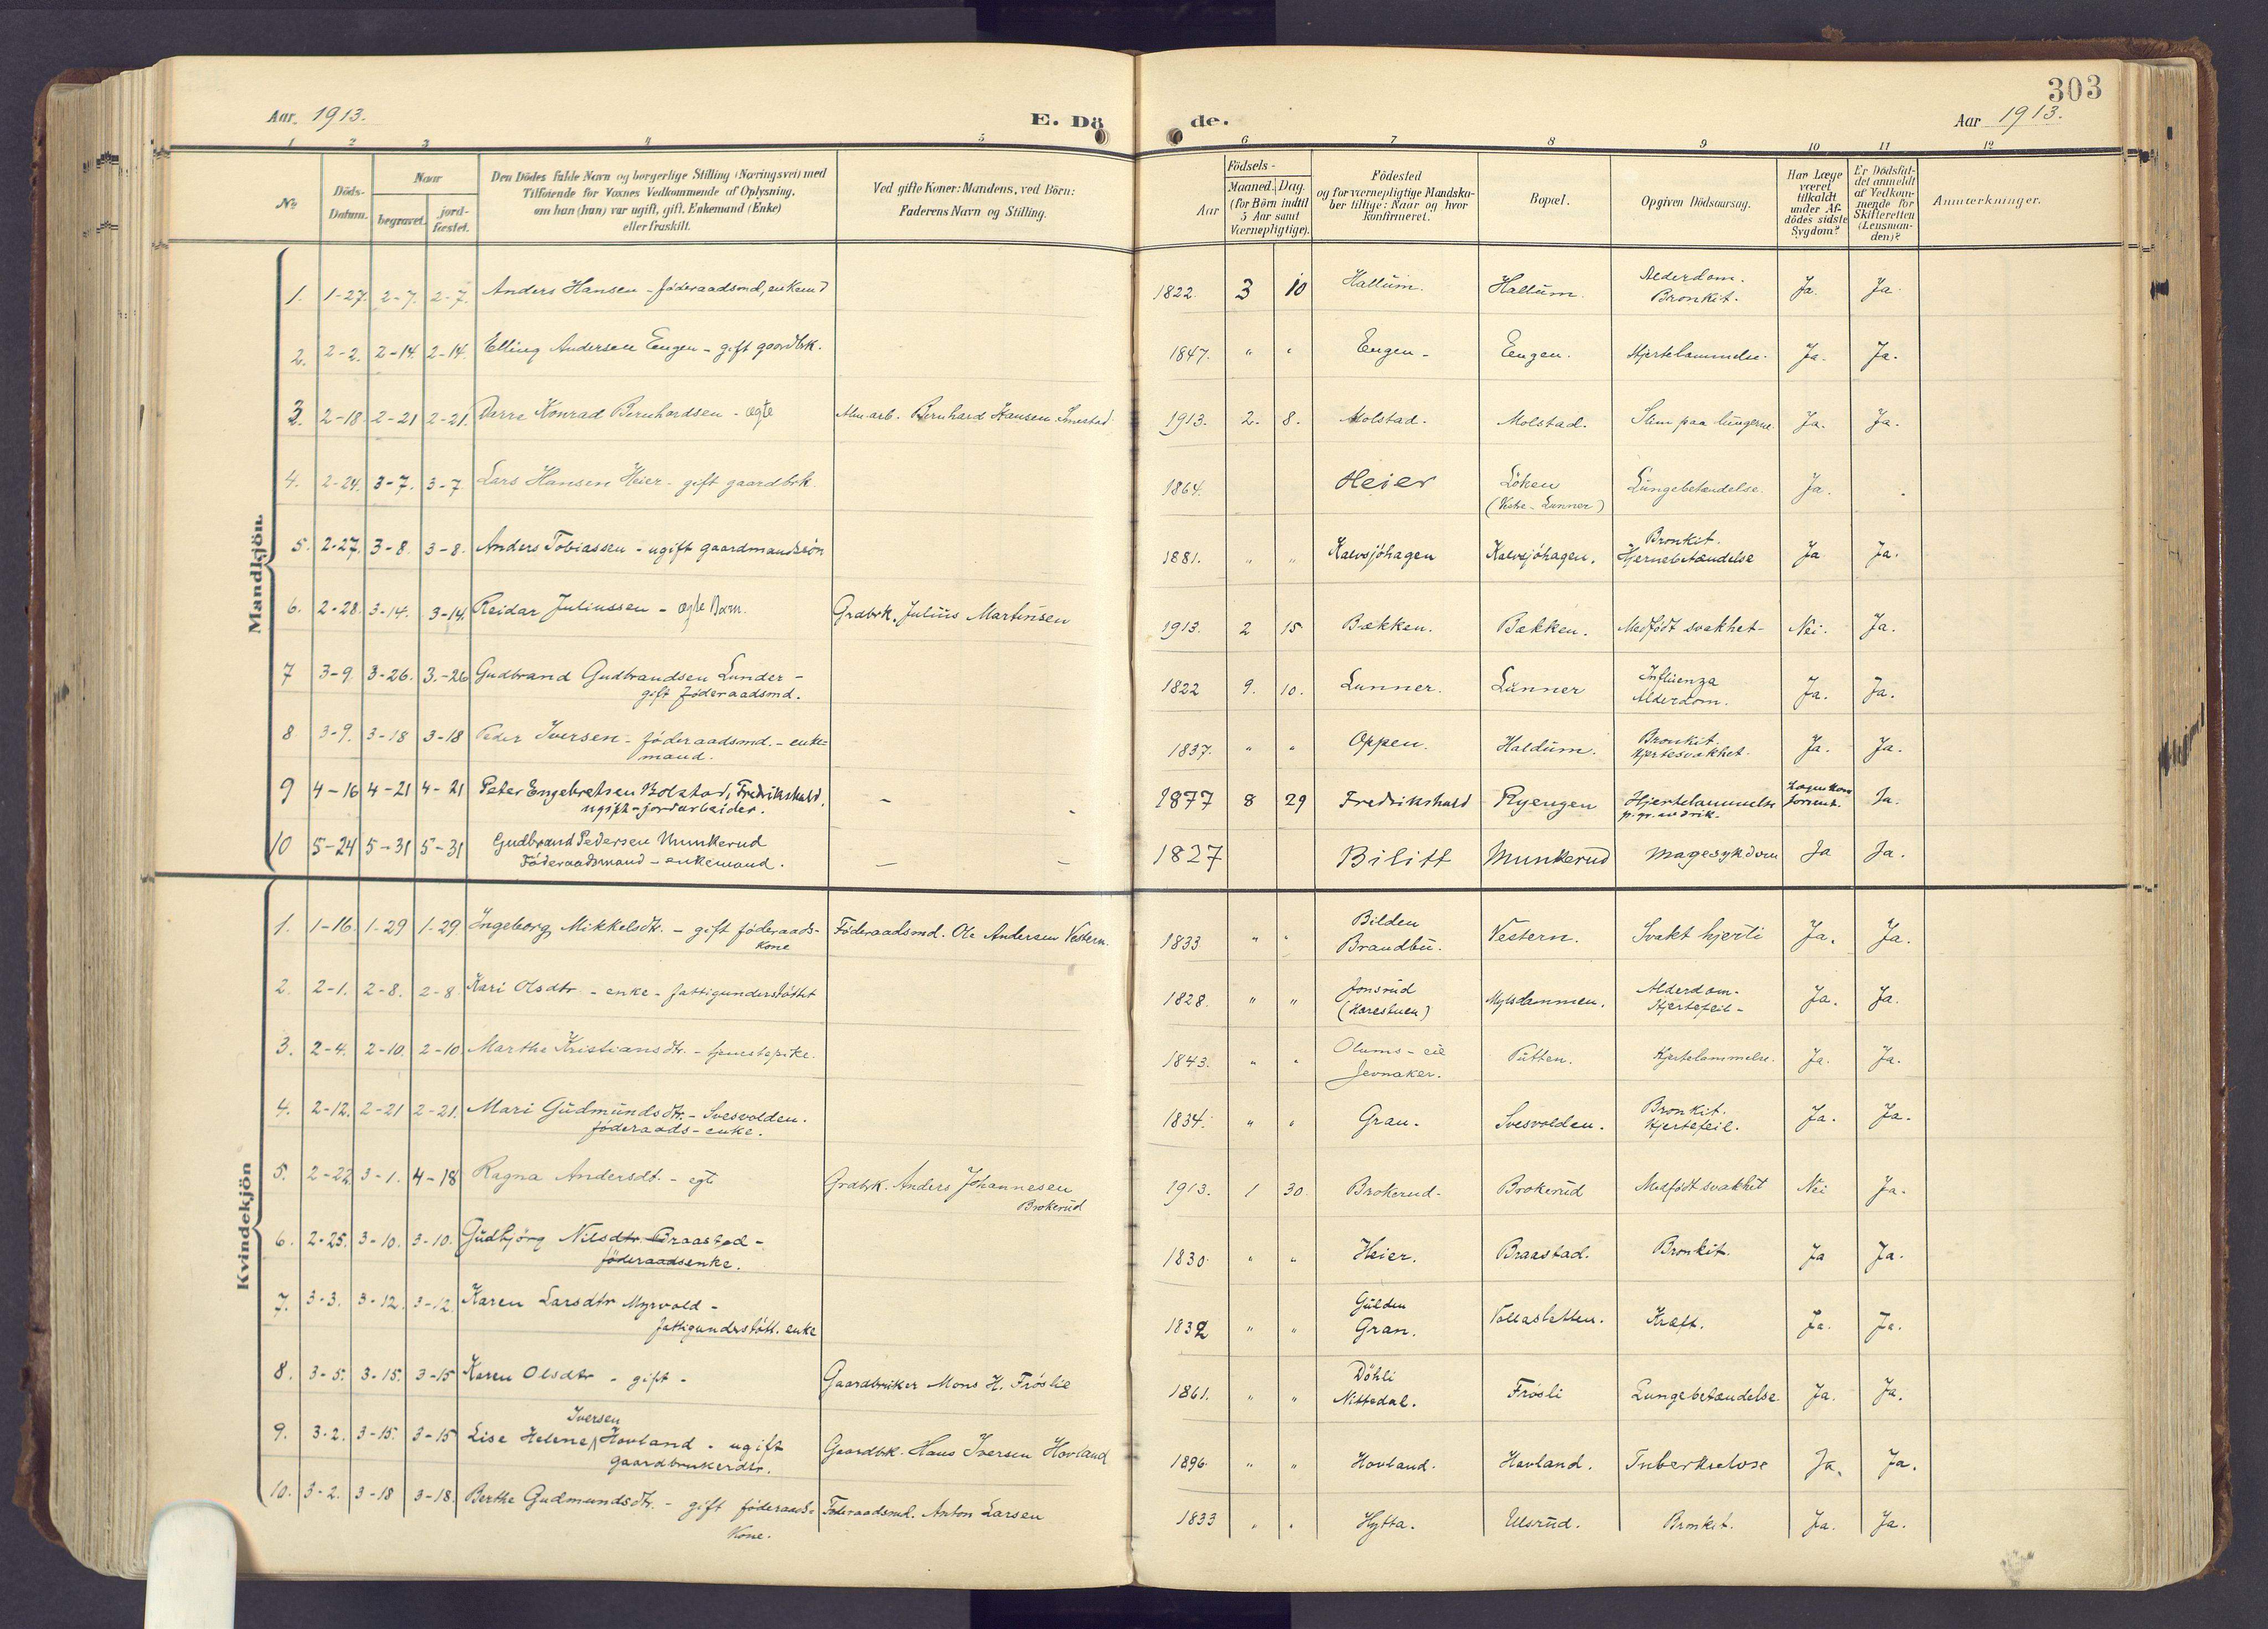 SAH, Lunner prestekontor, H/Ha/Haa/L0001: Ministerialbok nr. 1, 1907-1922, s. 303